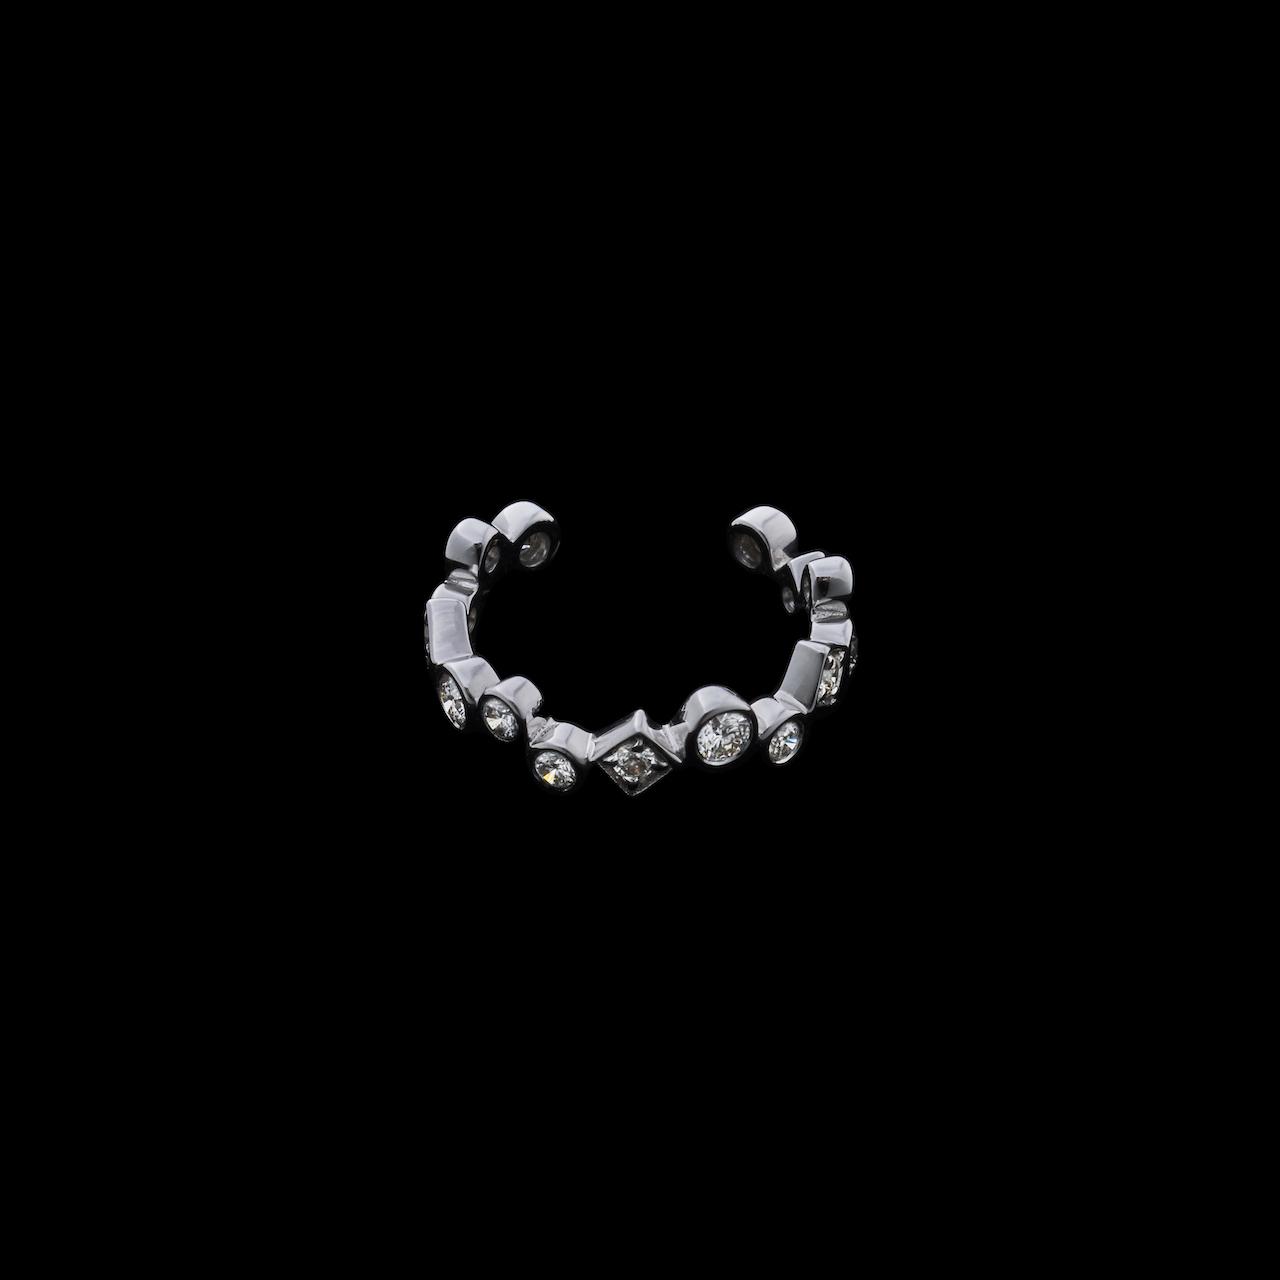 jewelG イヤカフ K18/ダイヤモンド